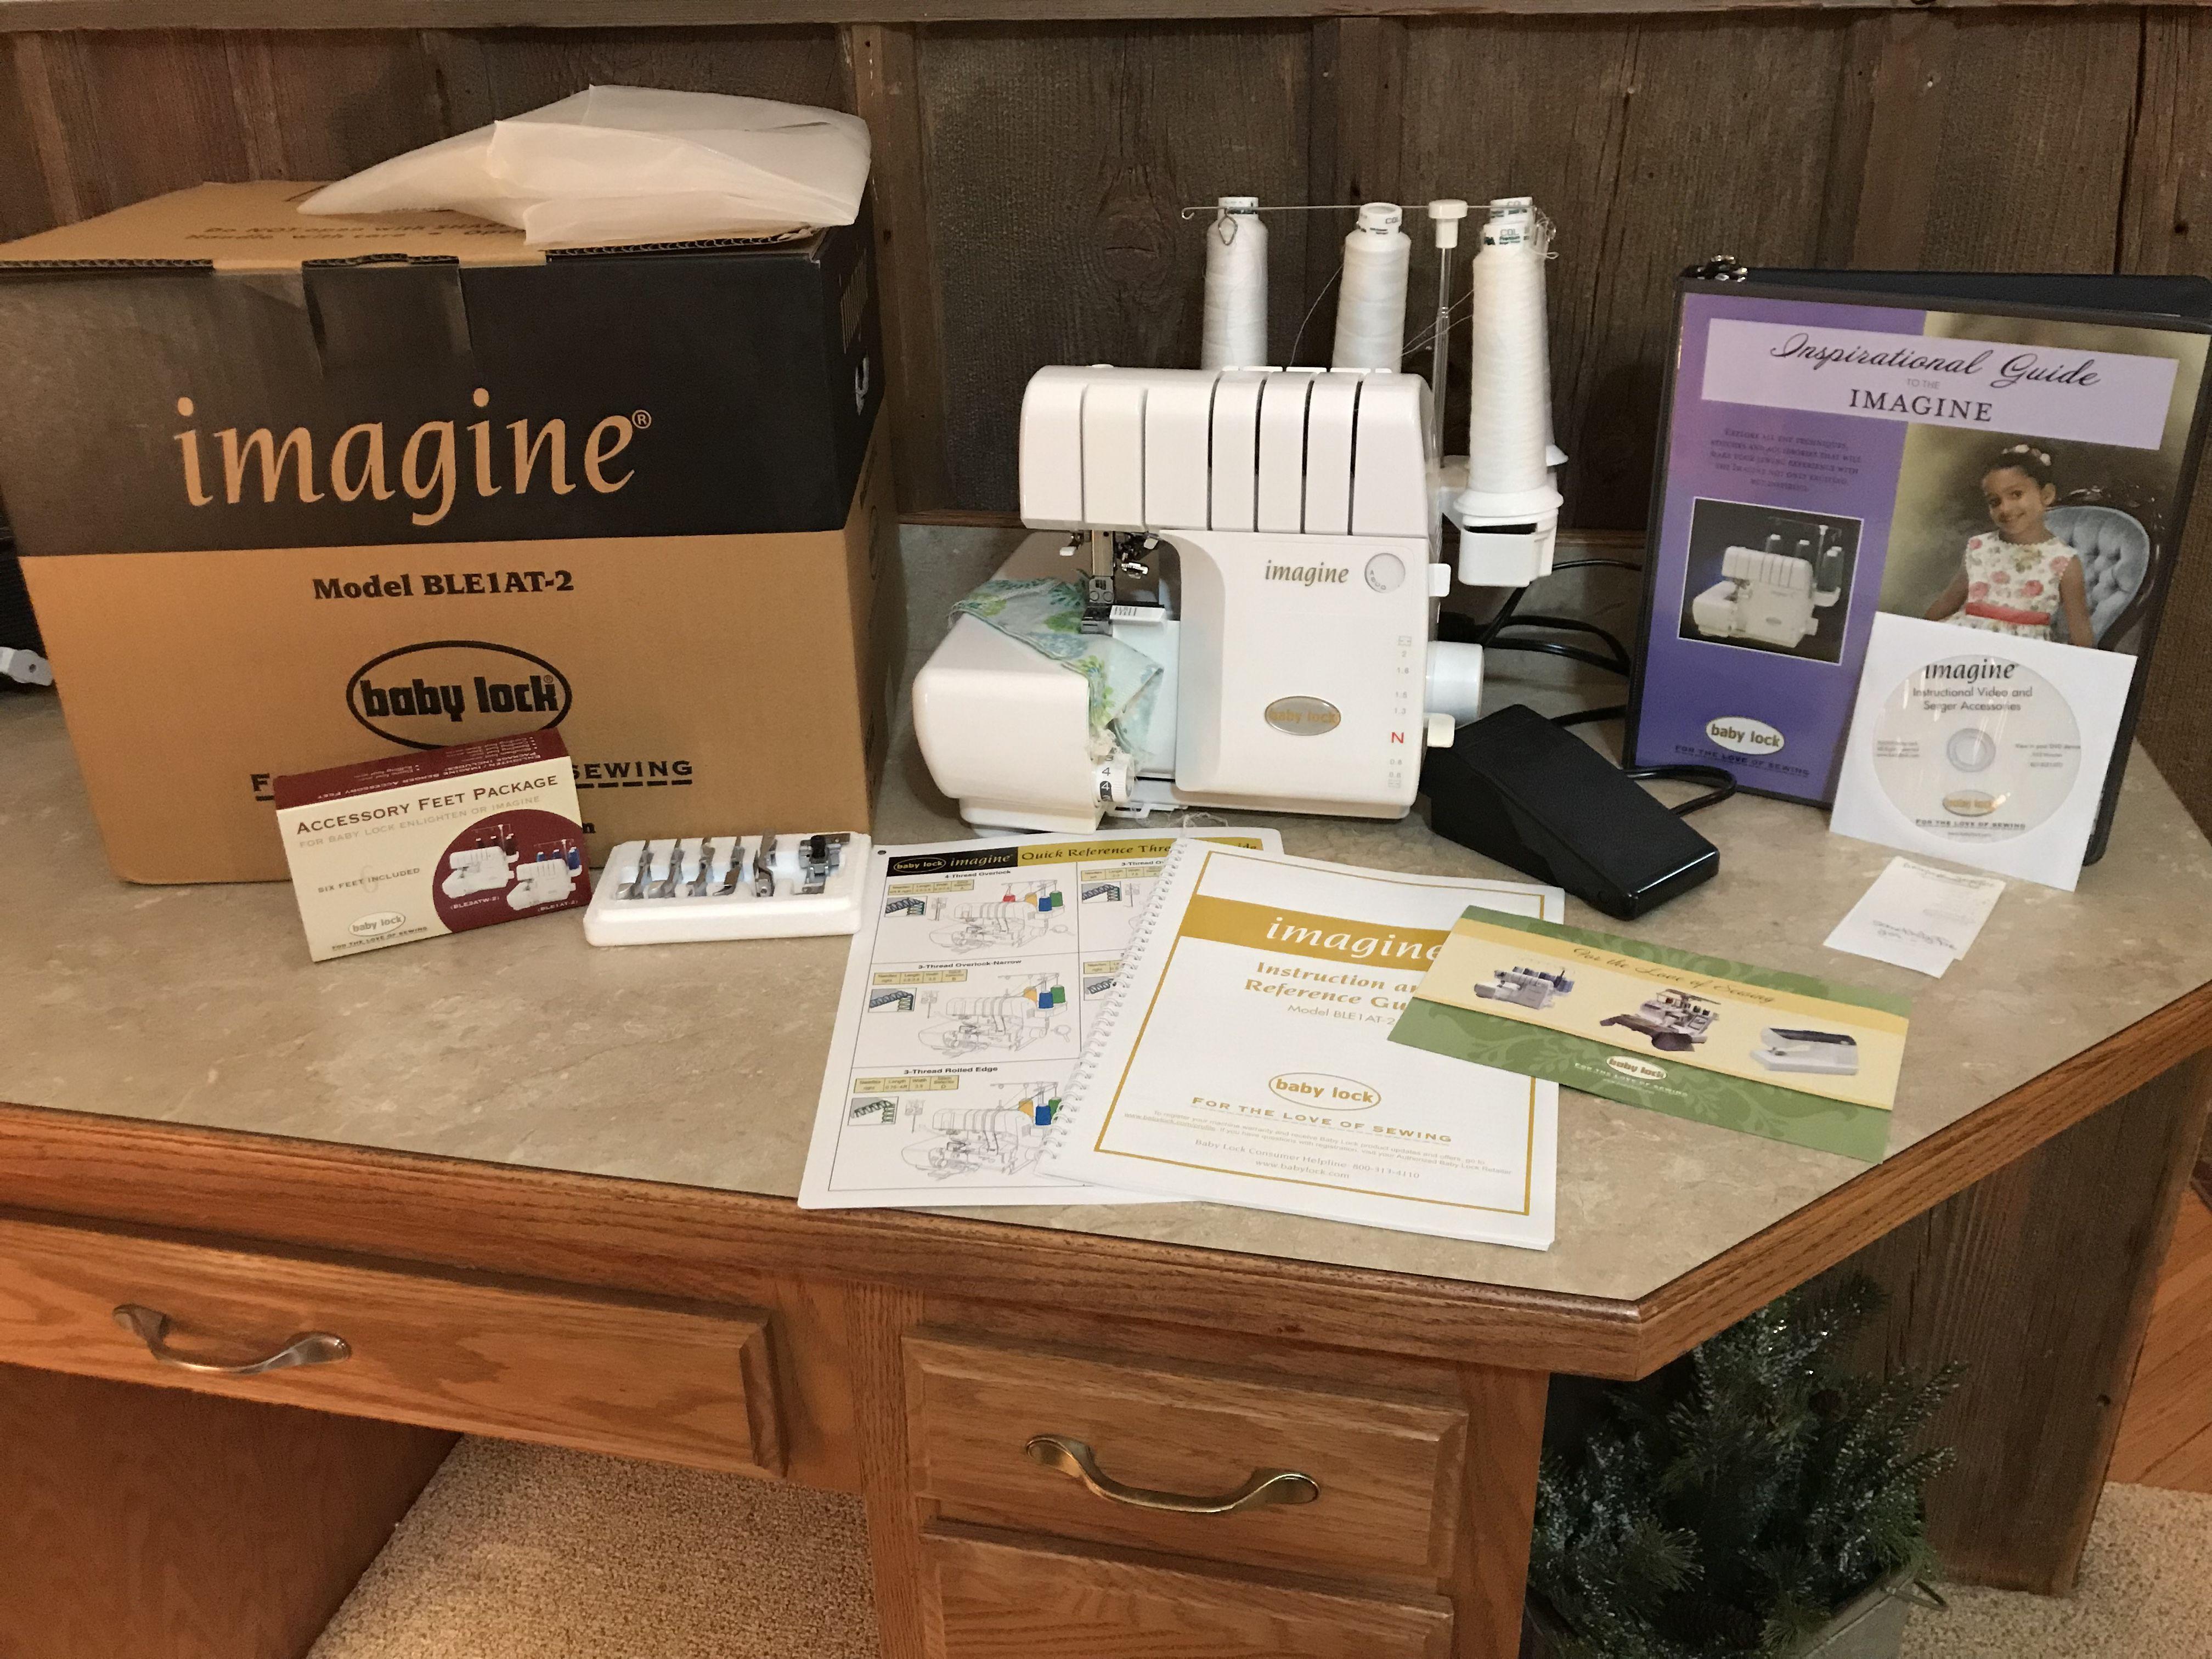 Baby lock serger sewing machine (Imagine) image 1